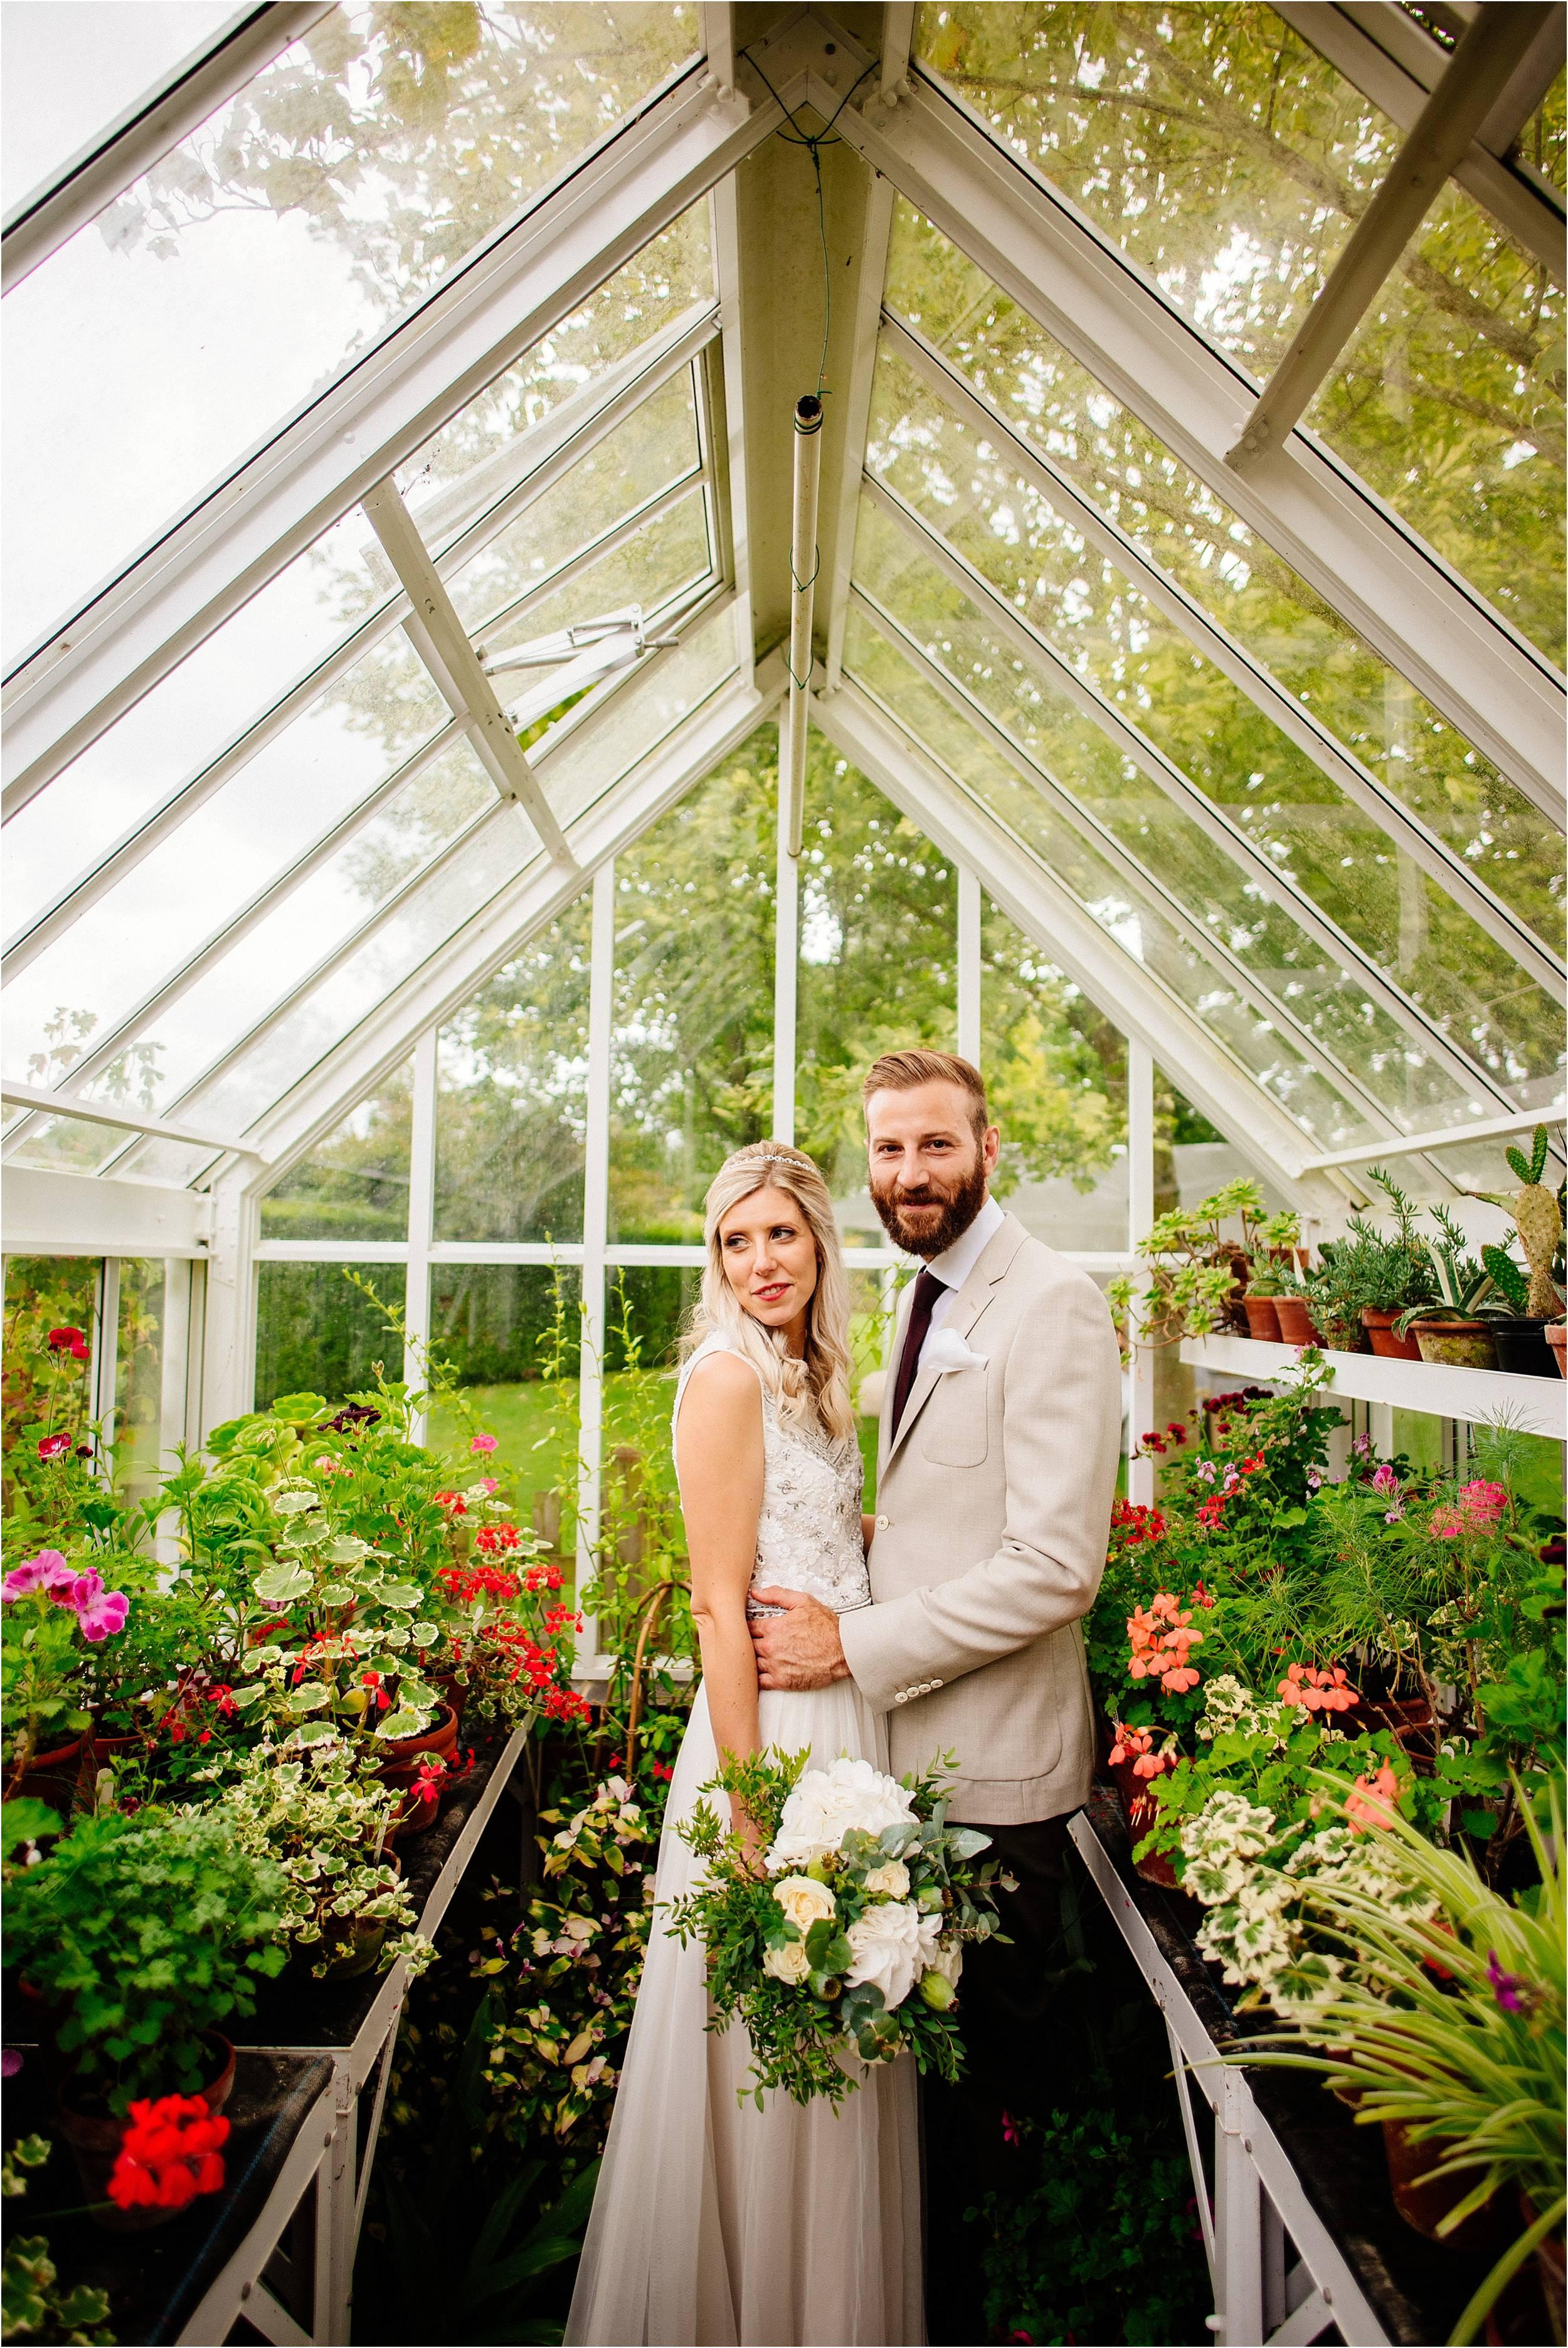 Barnsdale Gardens Wedding Photographer_0057.jpg